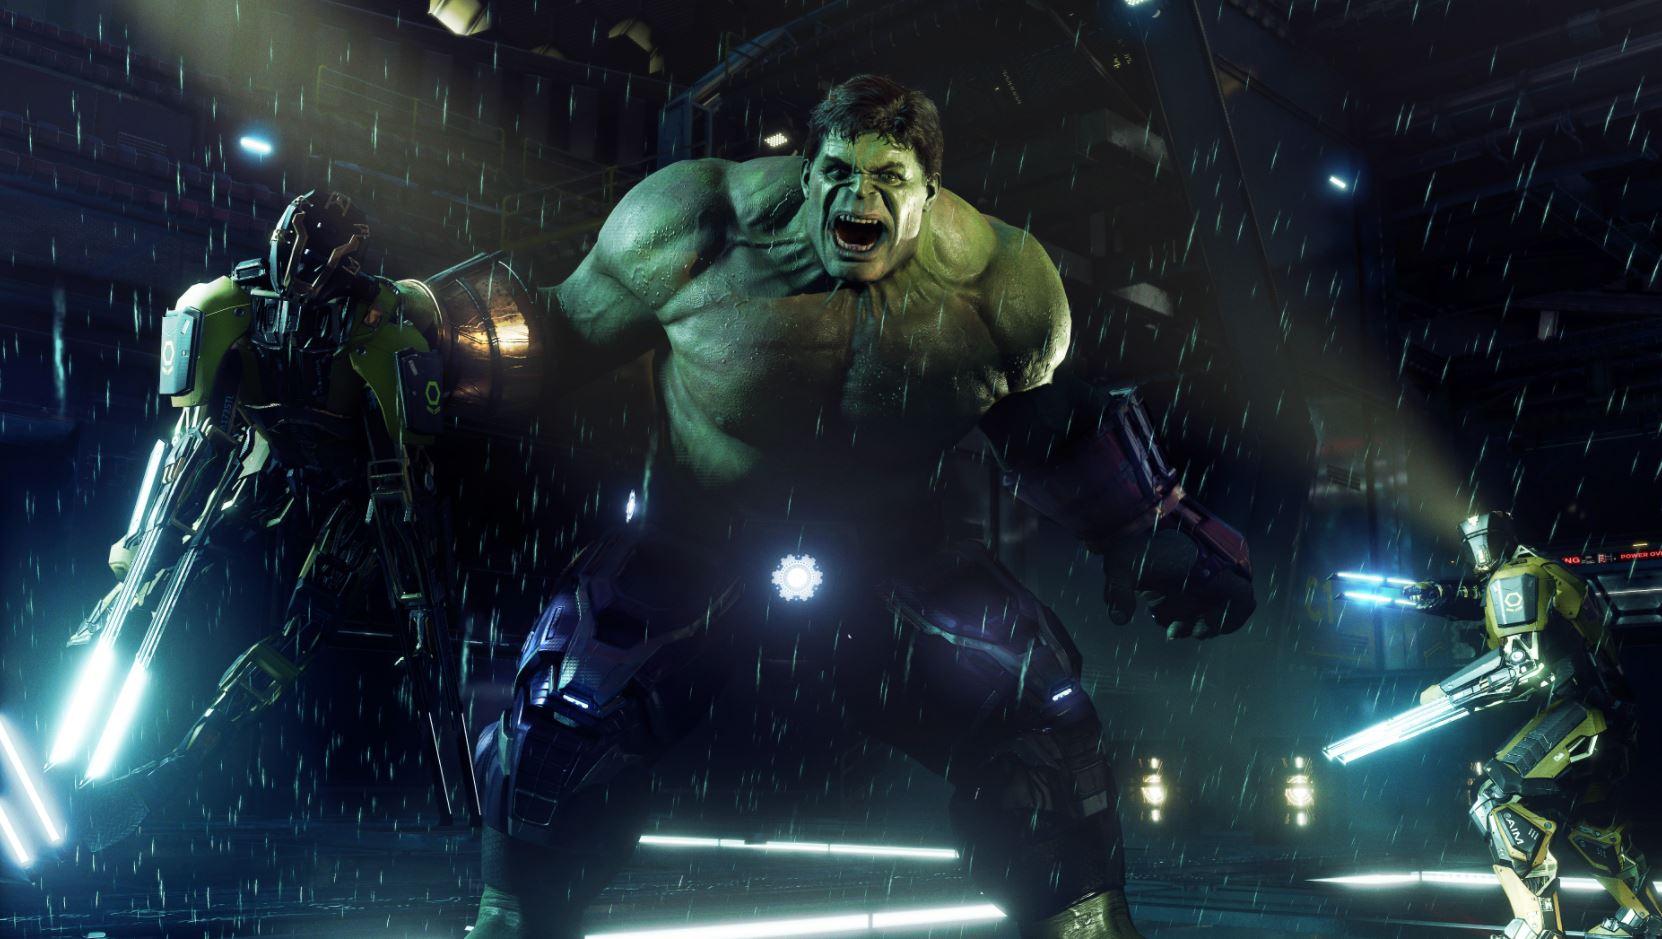 marvels-avengers-patch-update-ps4-crashing-crashes